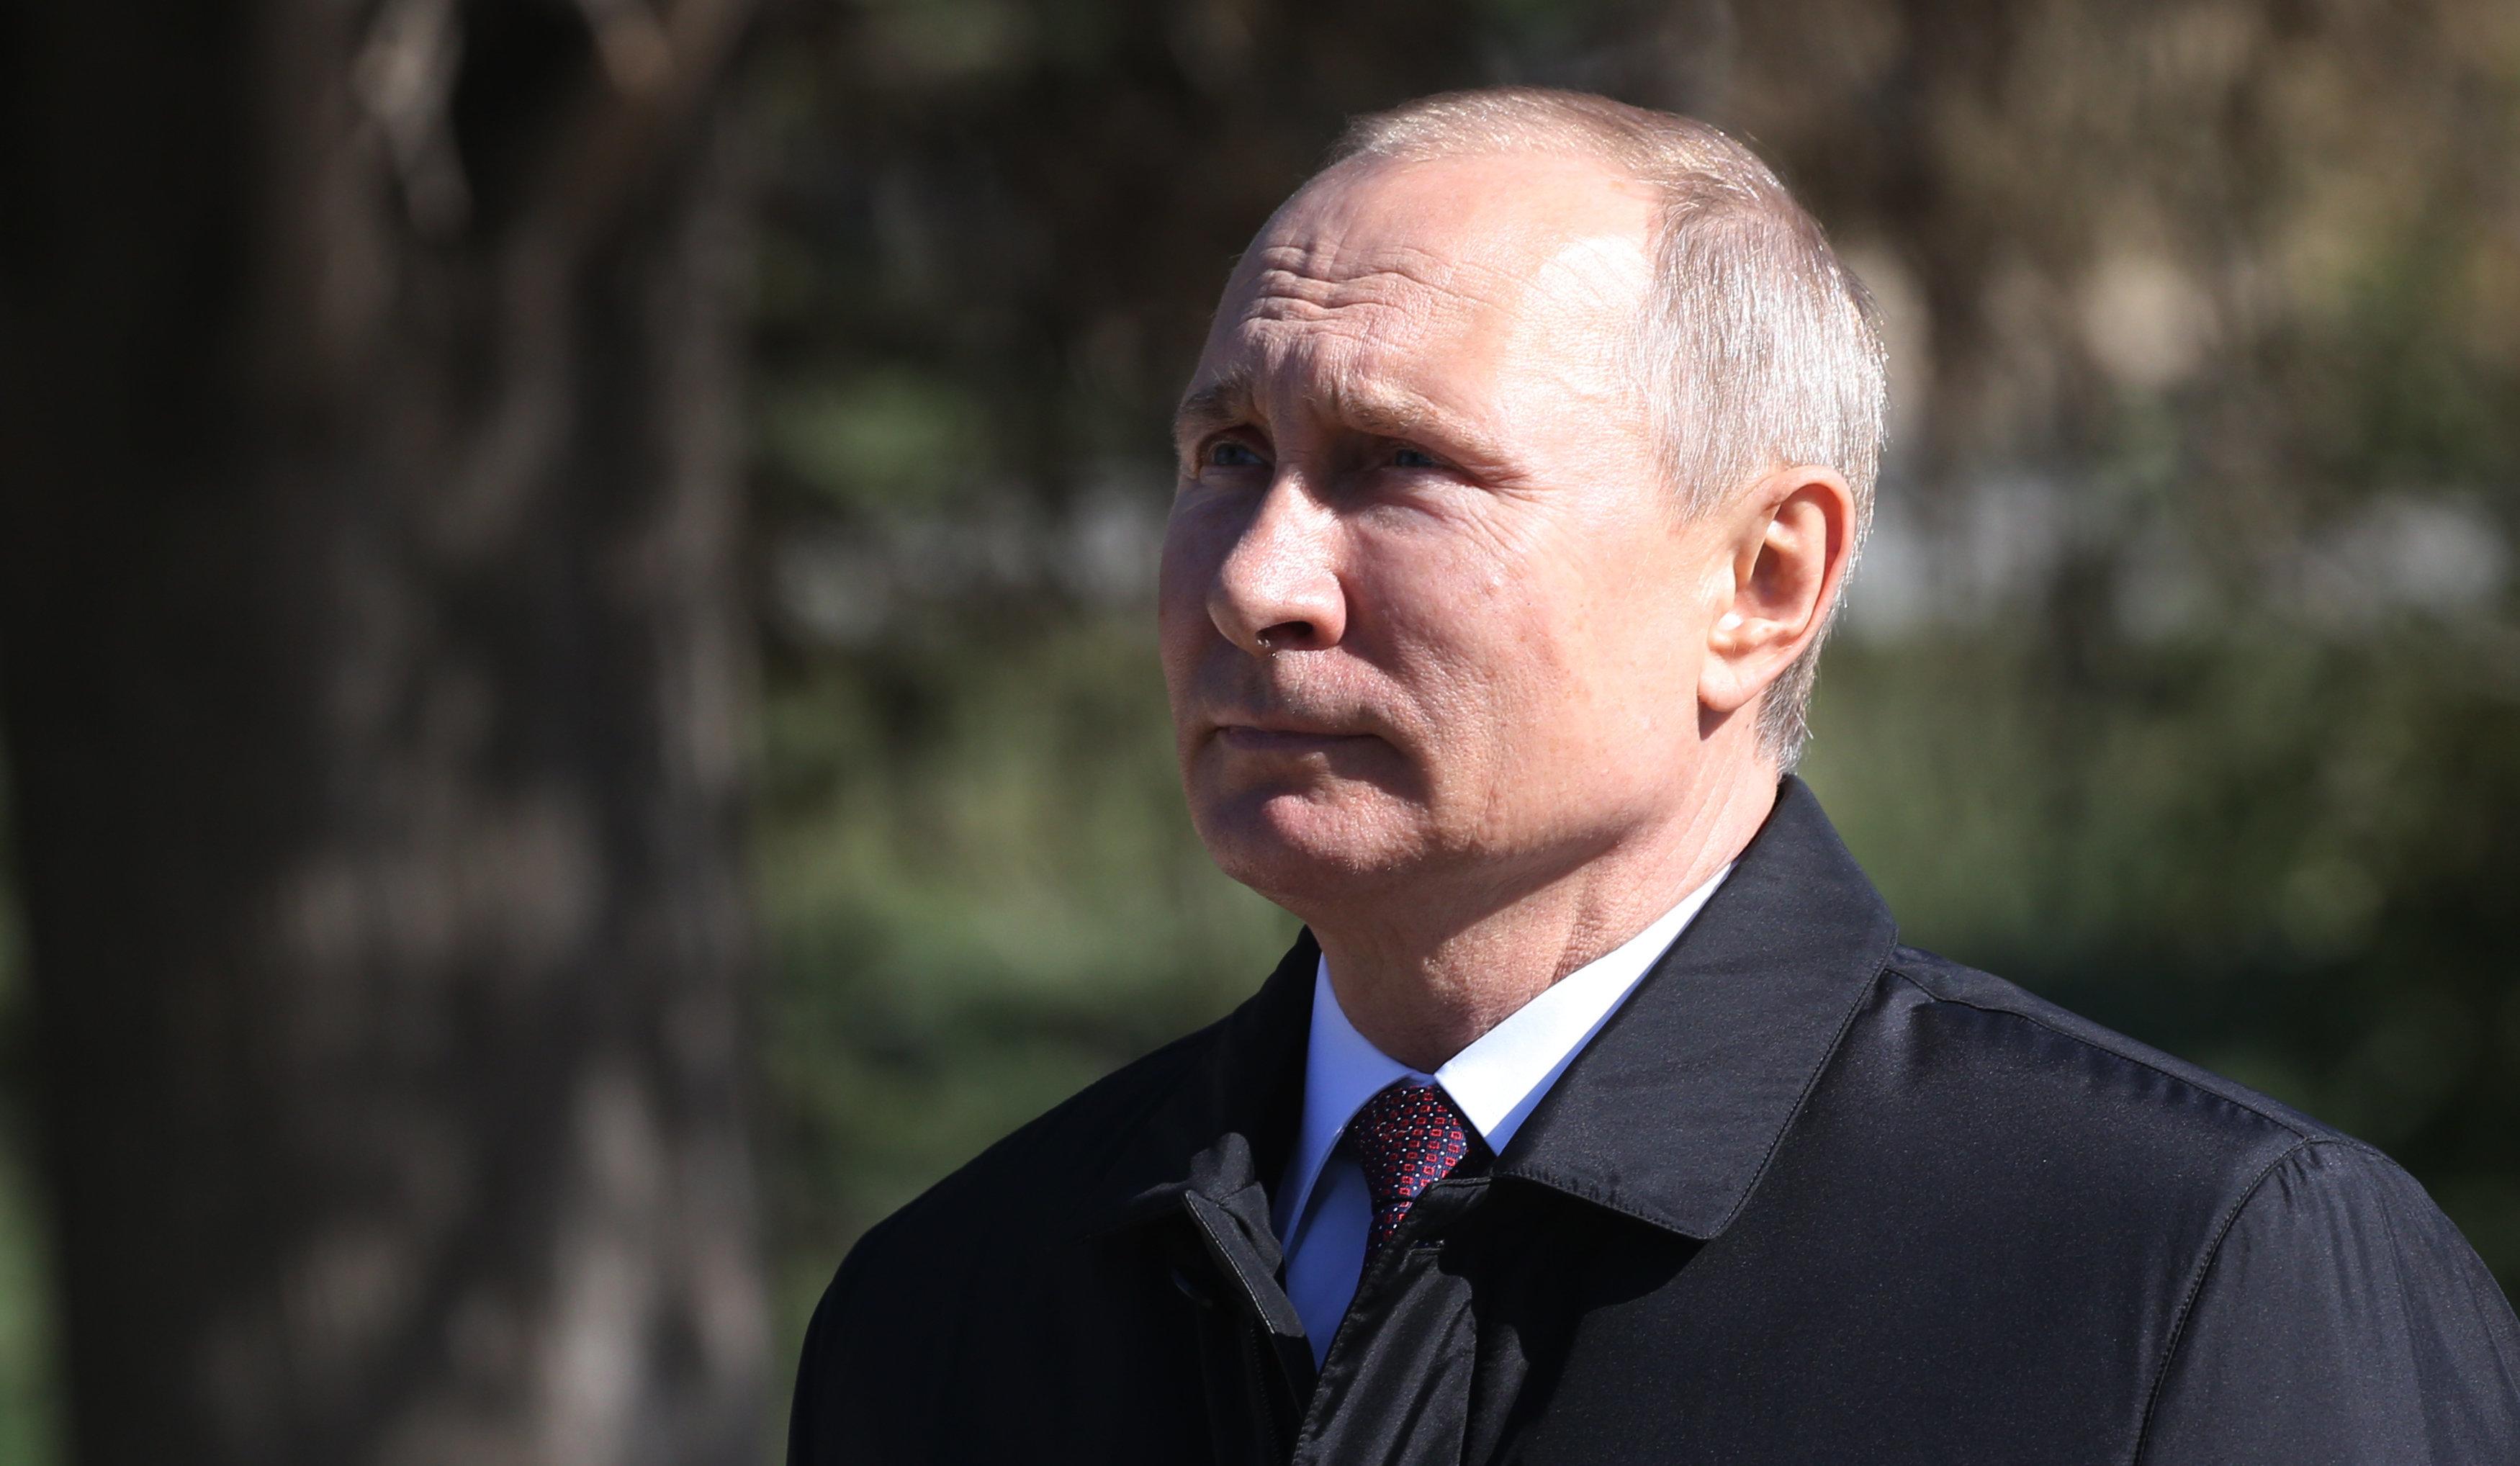 Putin Signs 'Fake News' Law Punishing Russian Media For Criticizing Him